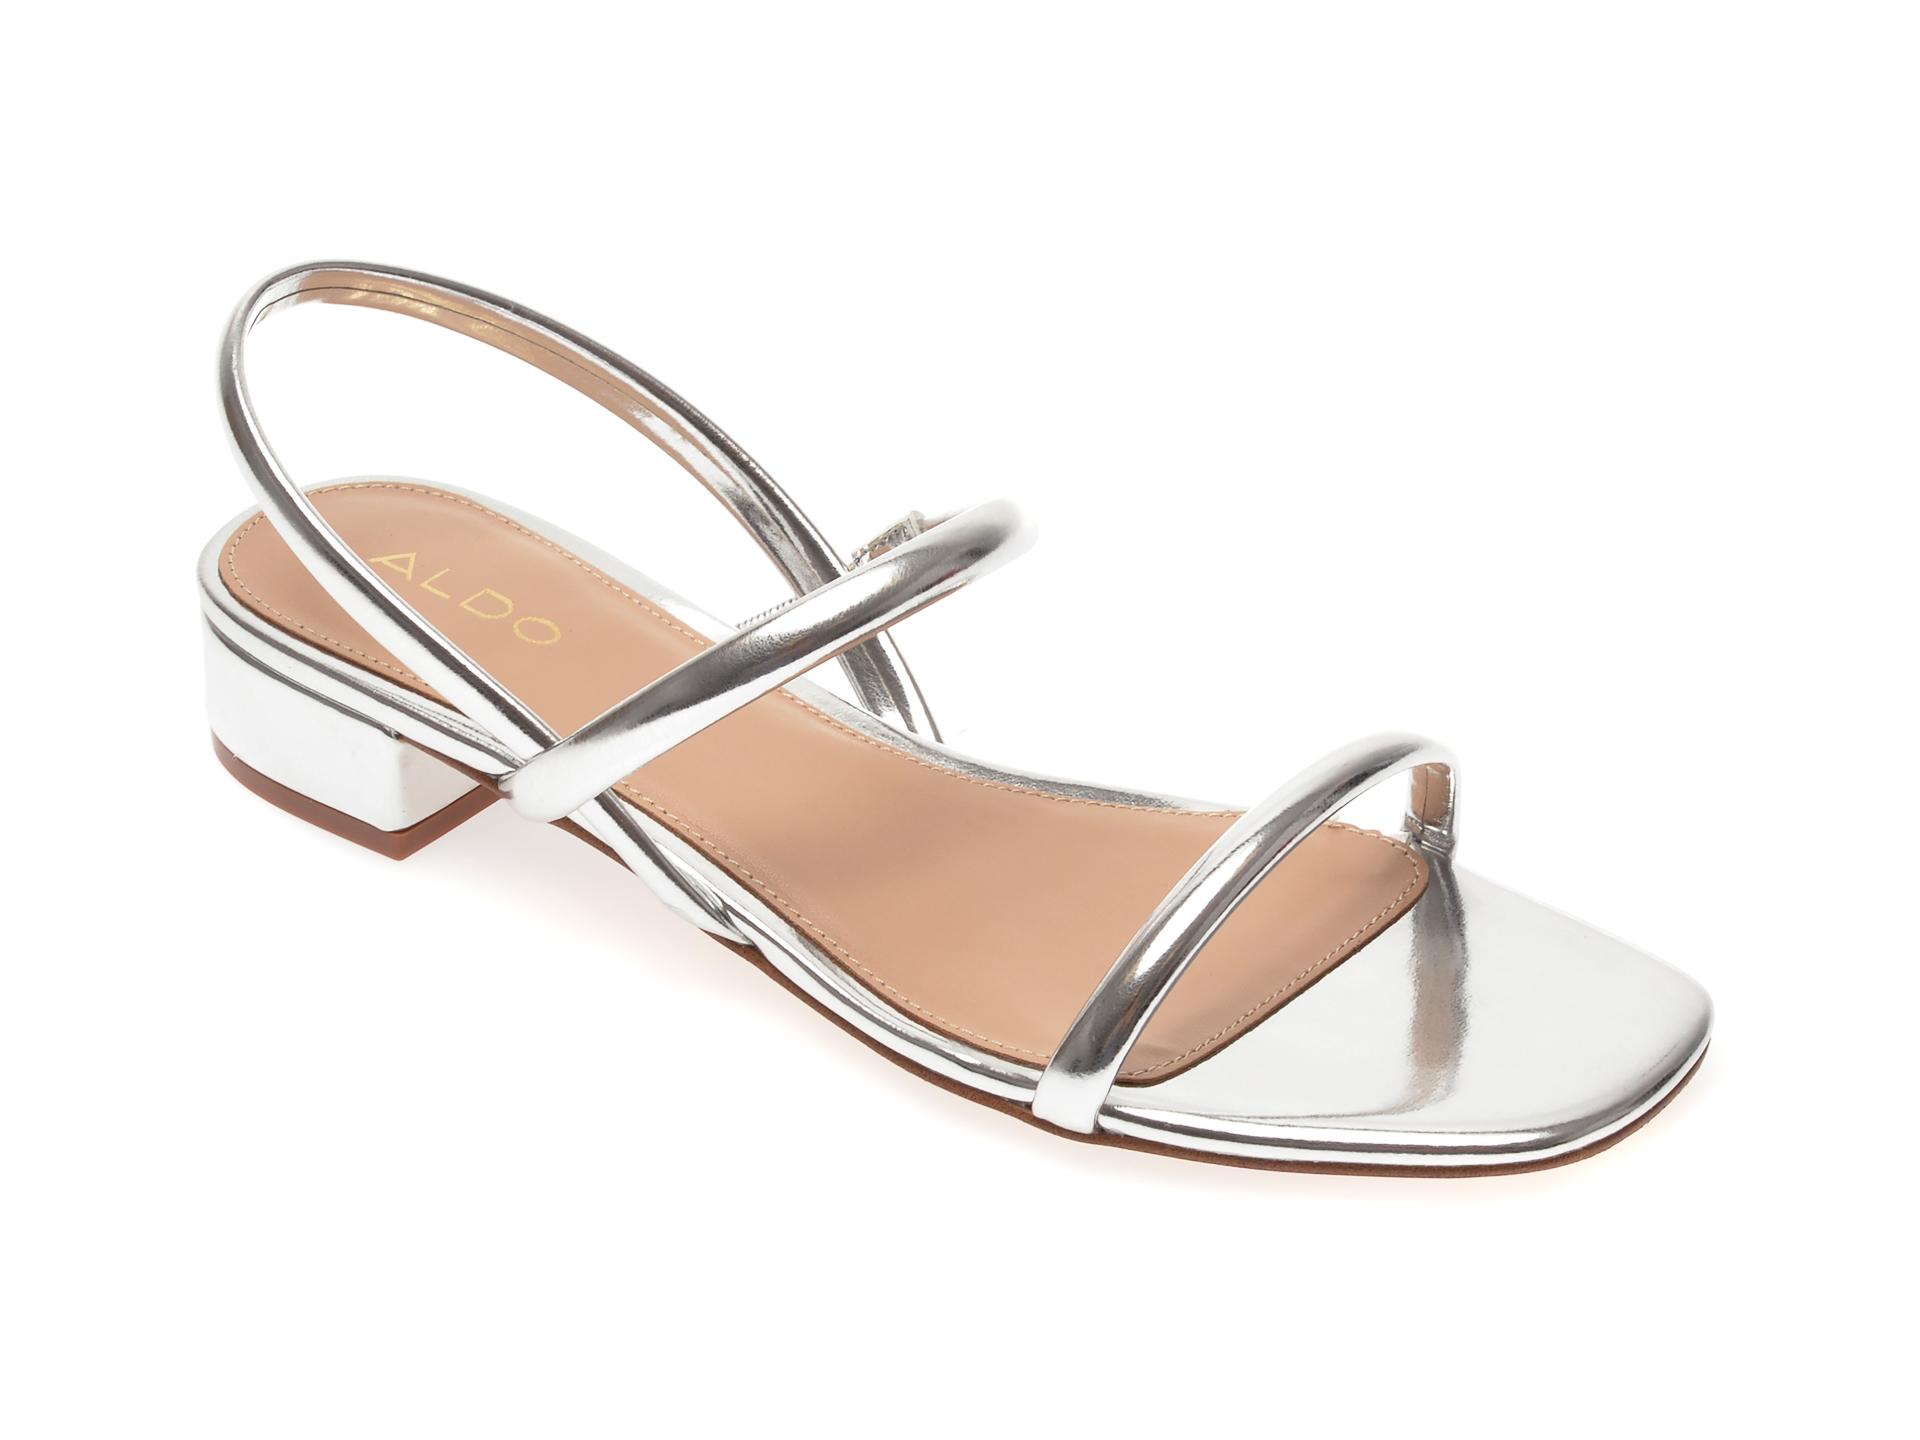 Sandale ALDO argintii, Candidly040, din piele ecologica New